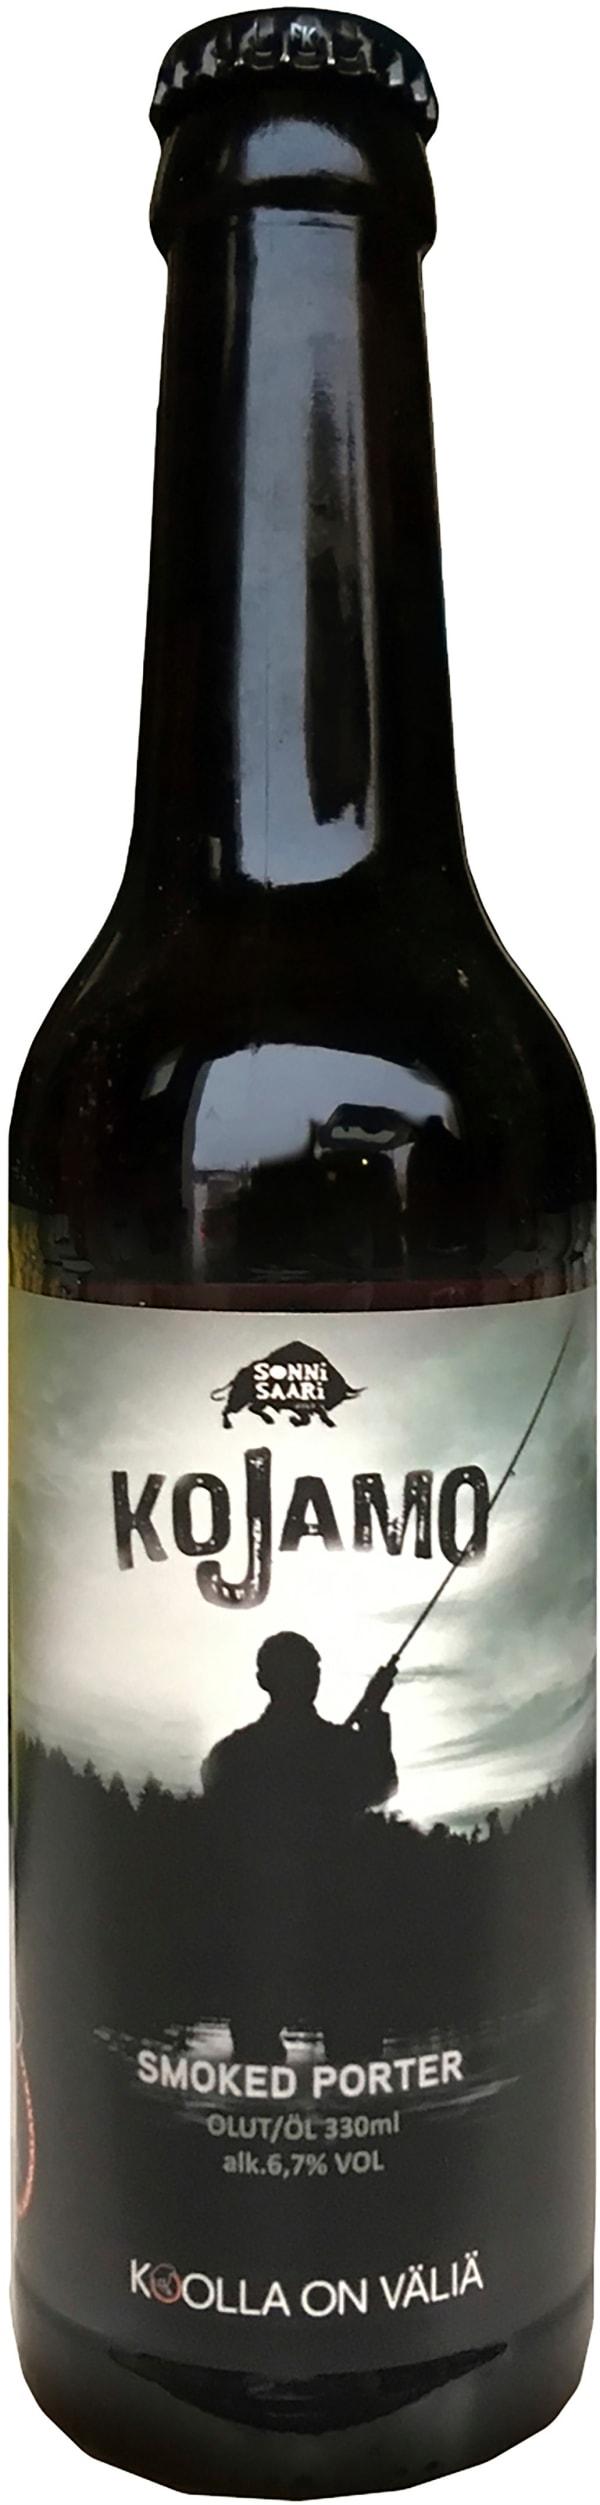 Sonnisaari Kojamo Smoked Porter